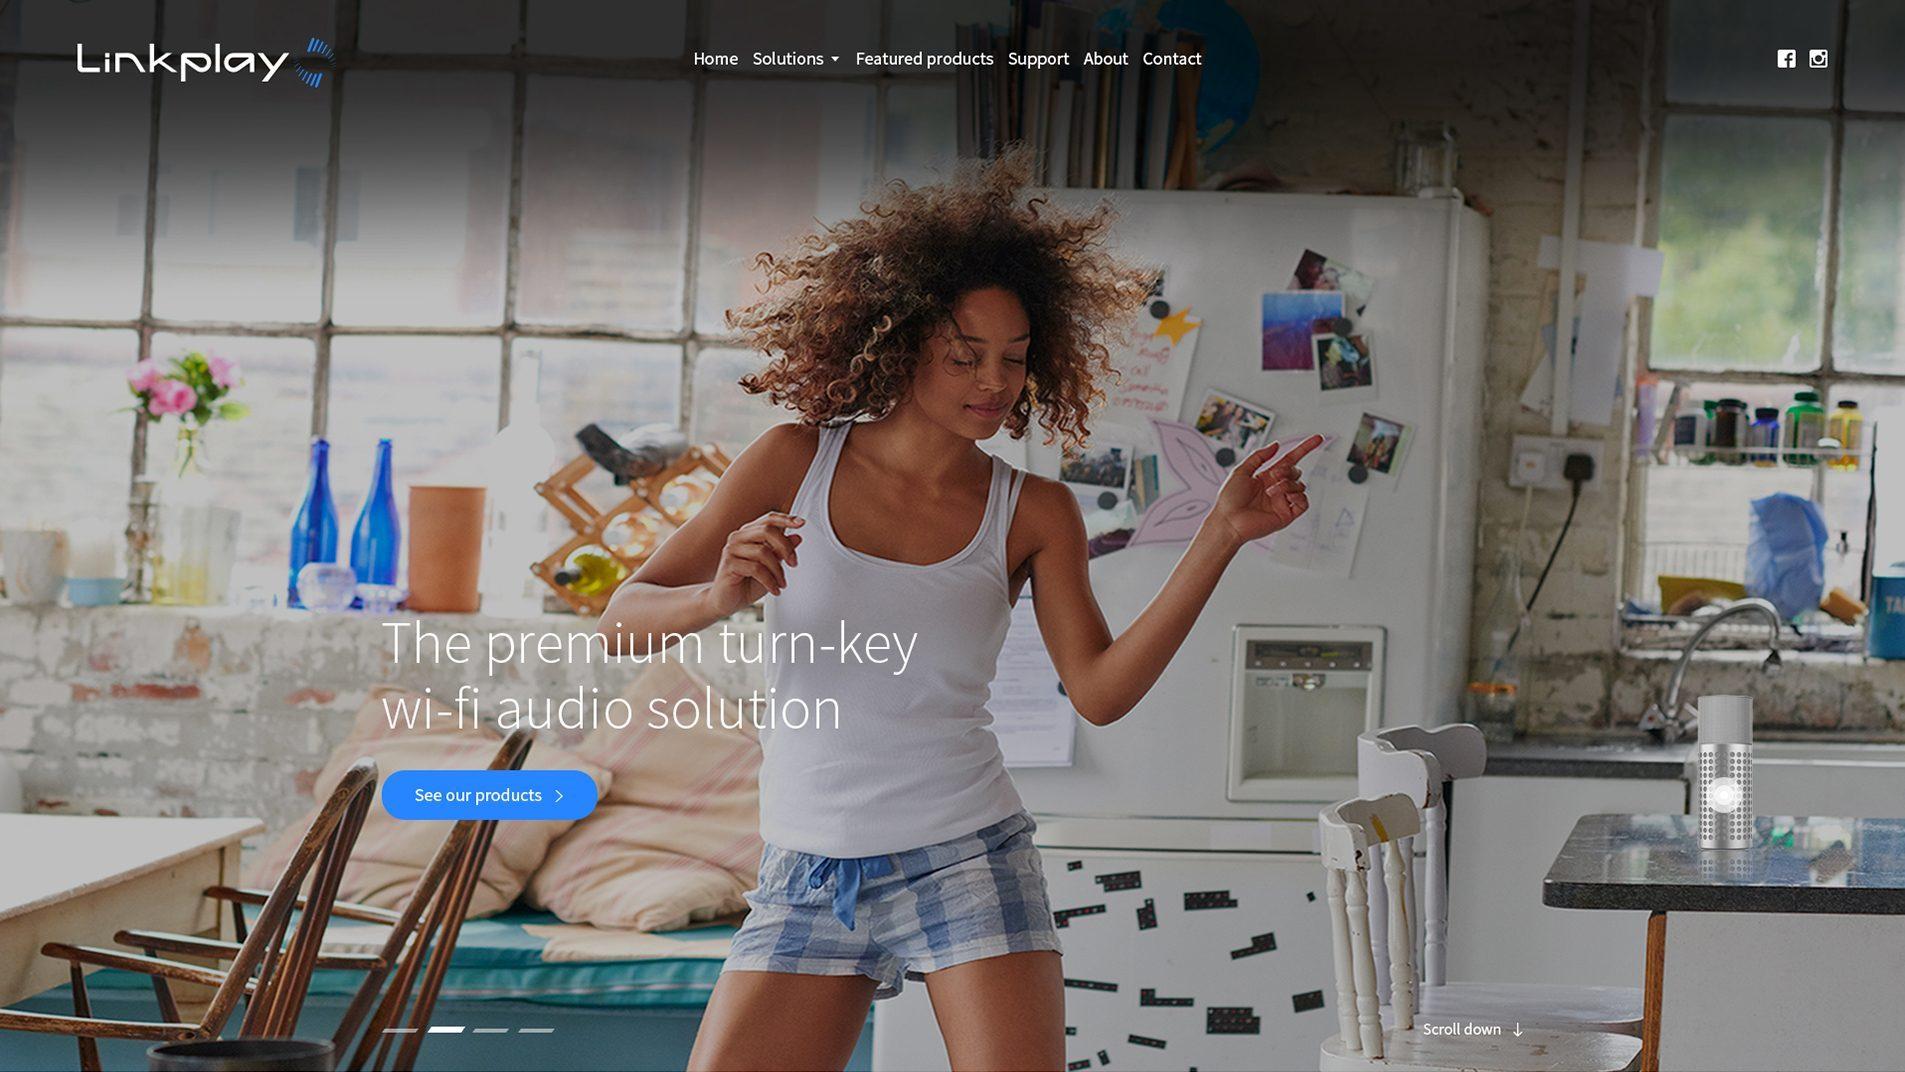 linkplay Website Design Preview